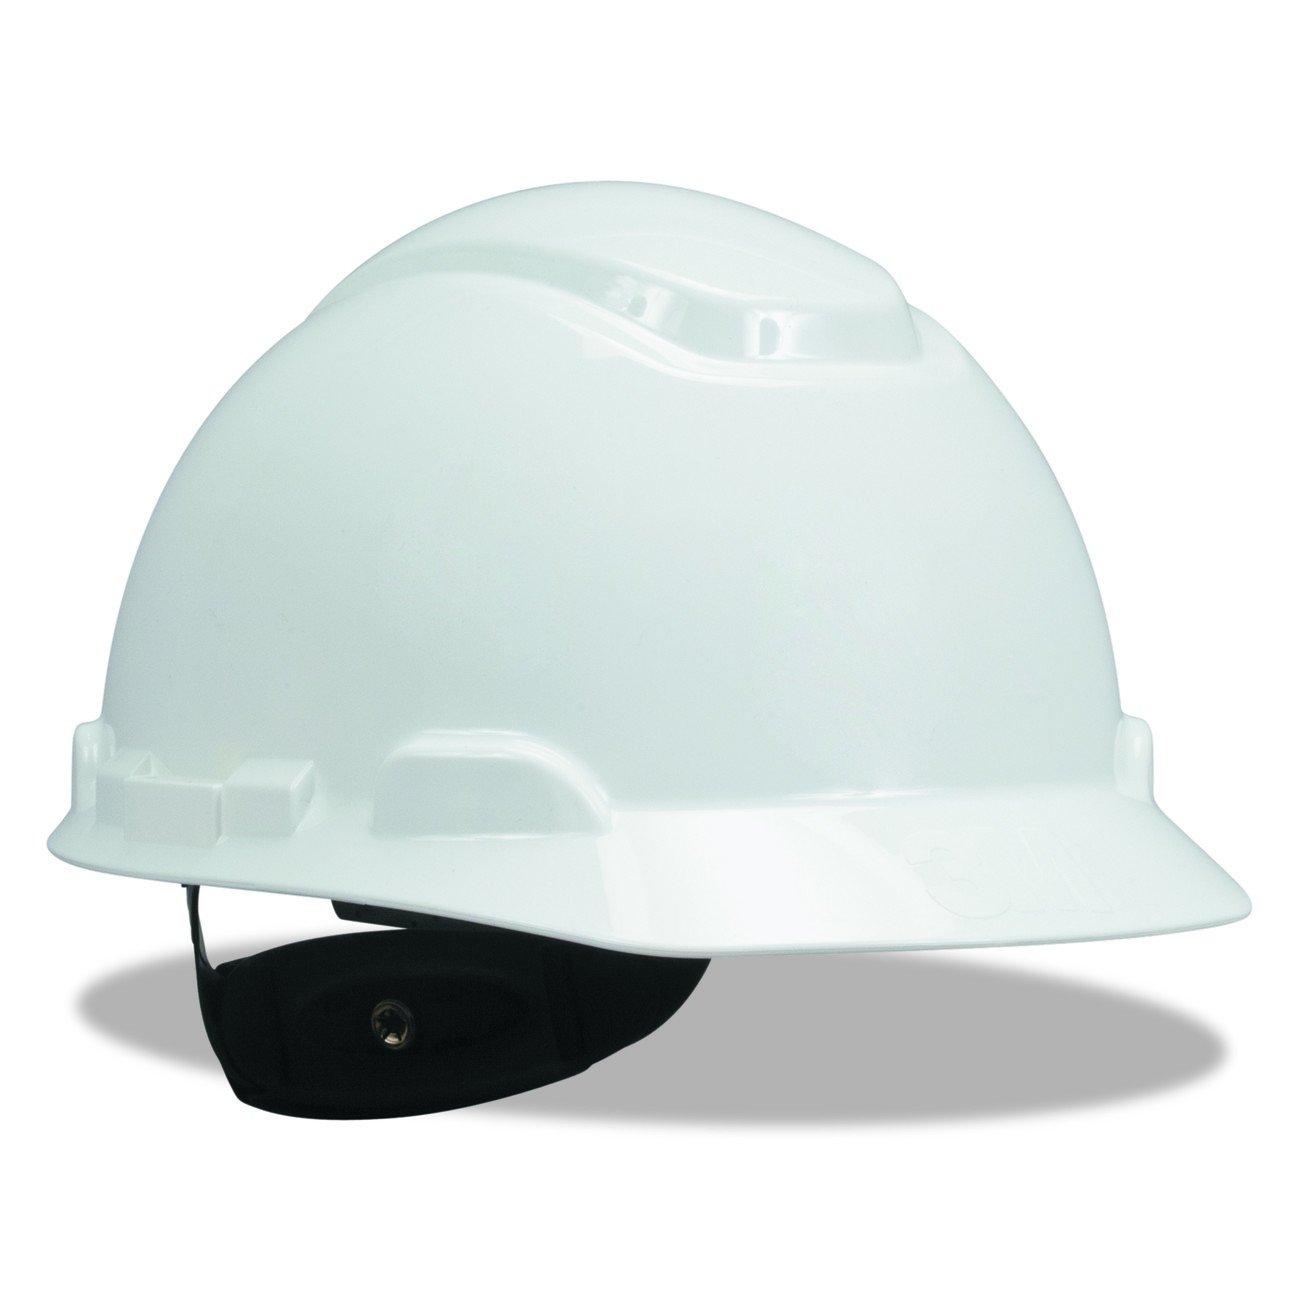 3M Hard Hat, White 4-Point Ratchet Suspension H-701R